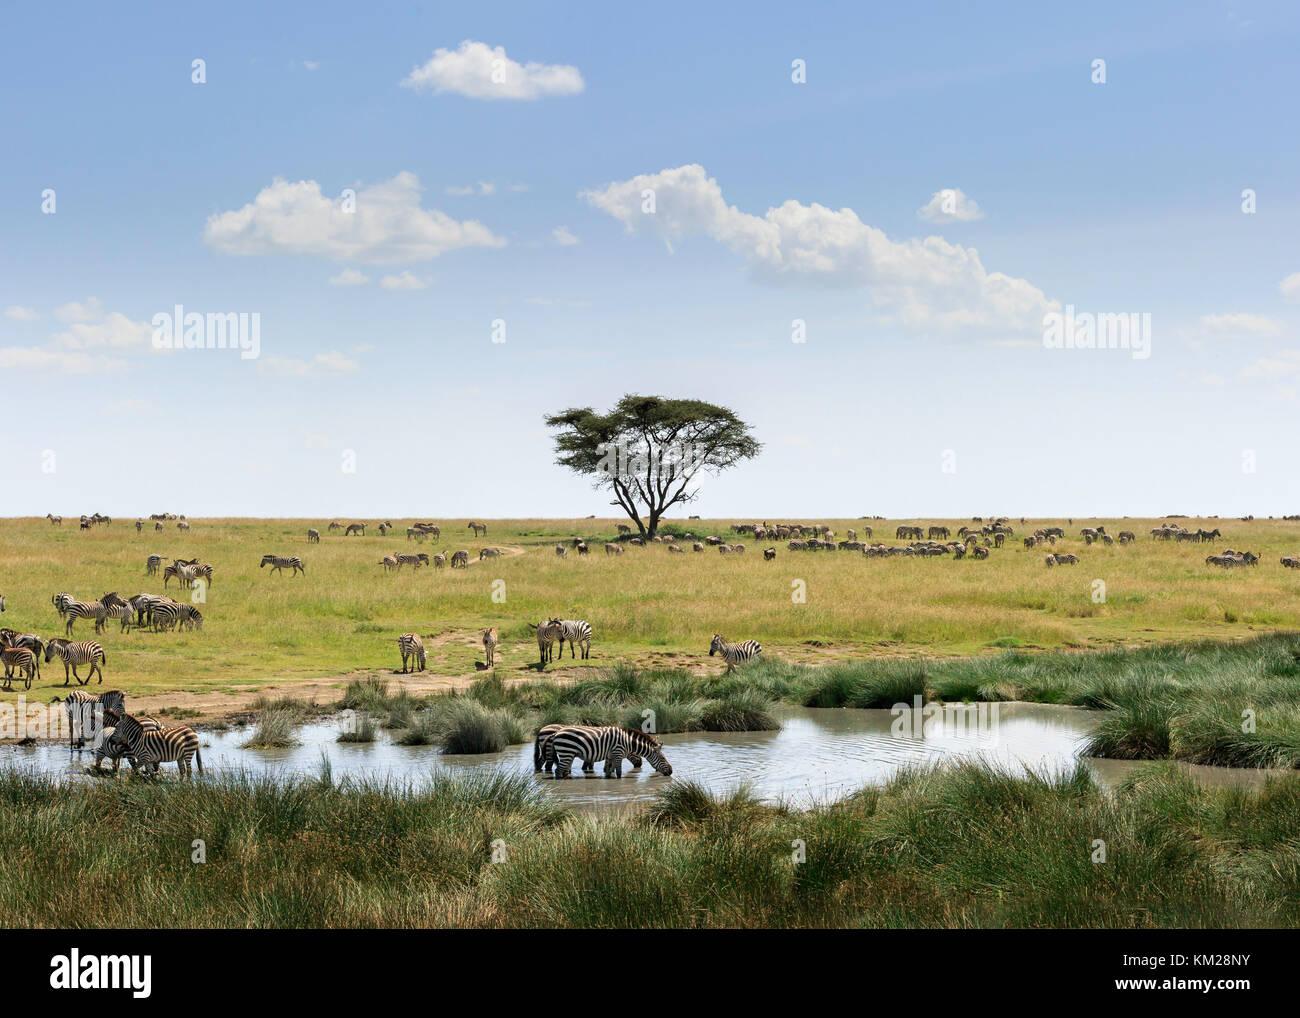 Zebras grazing in the Serengeti, Tanzania, Africa Stock Photo